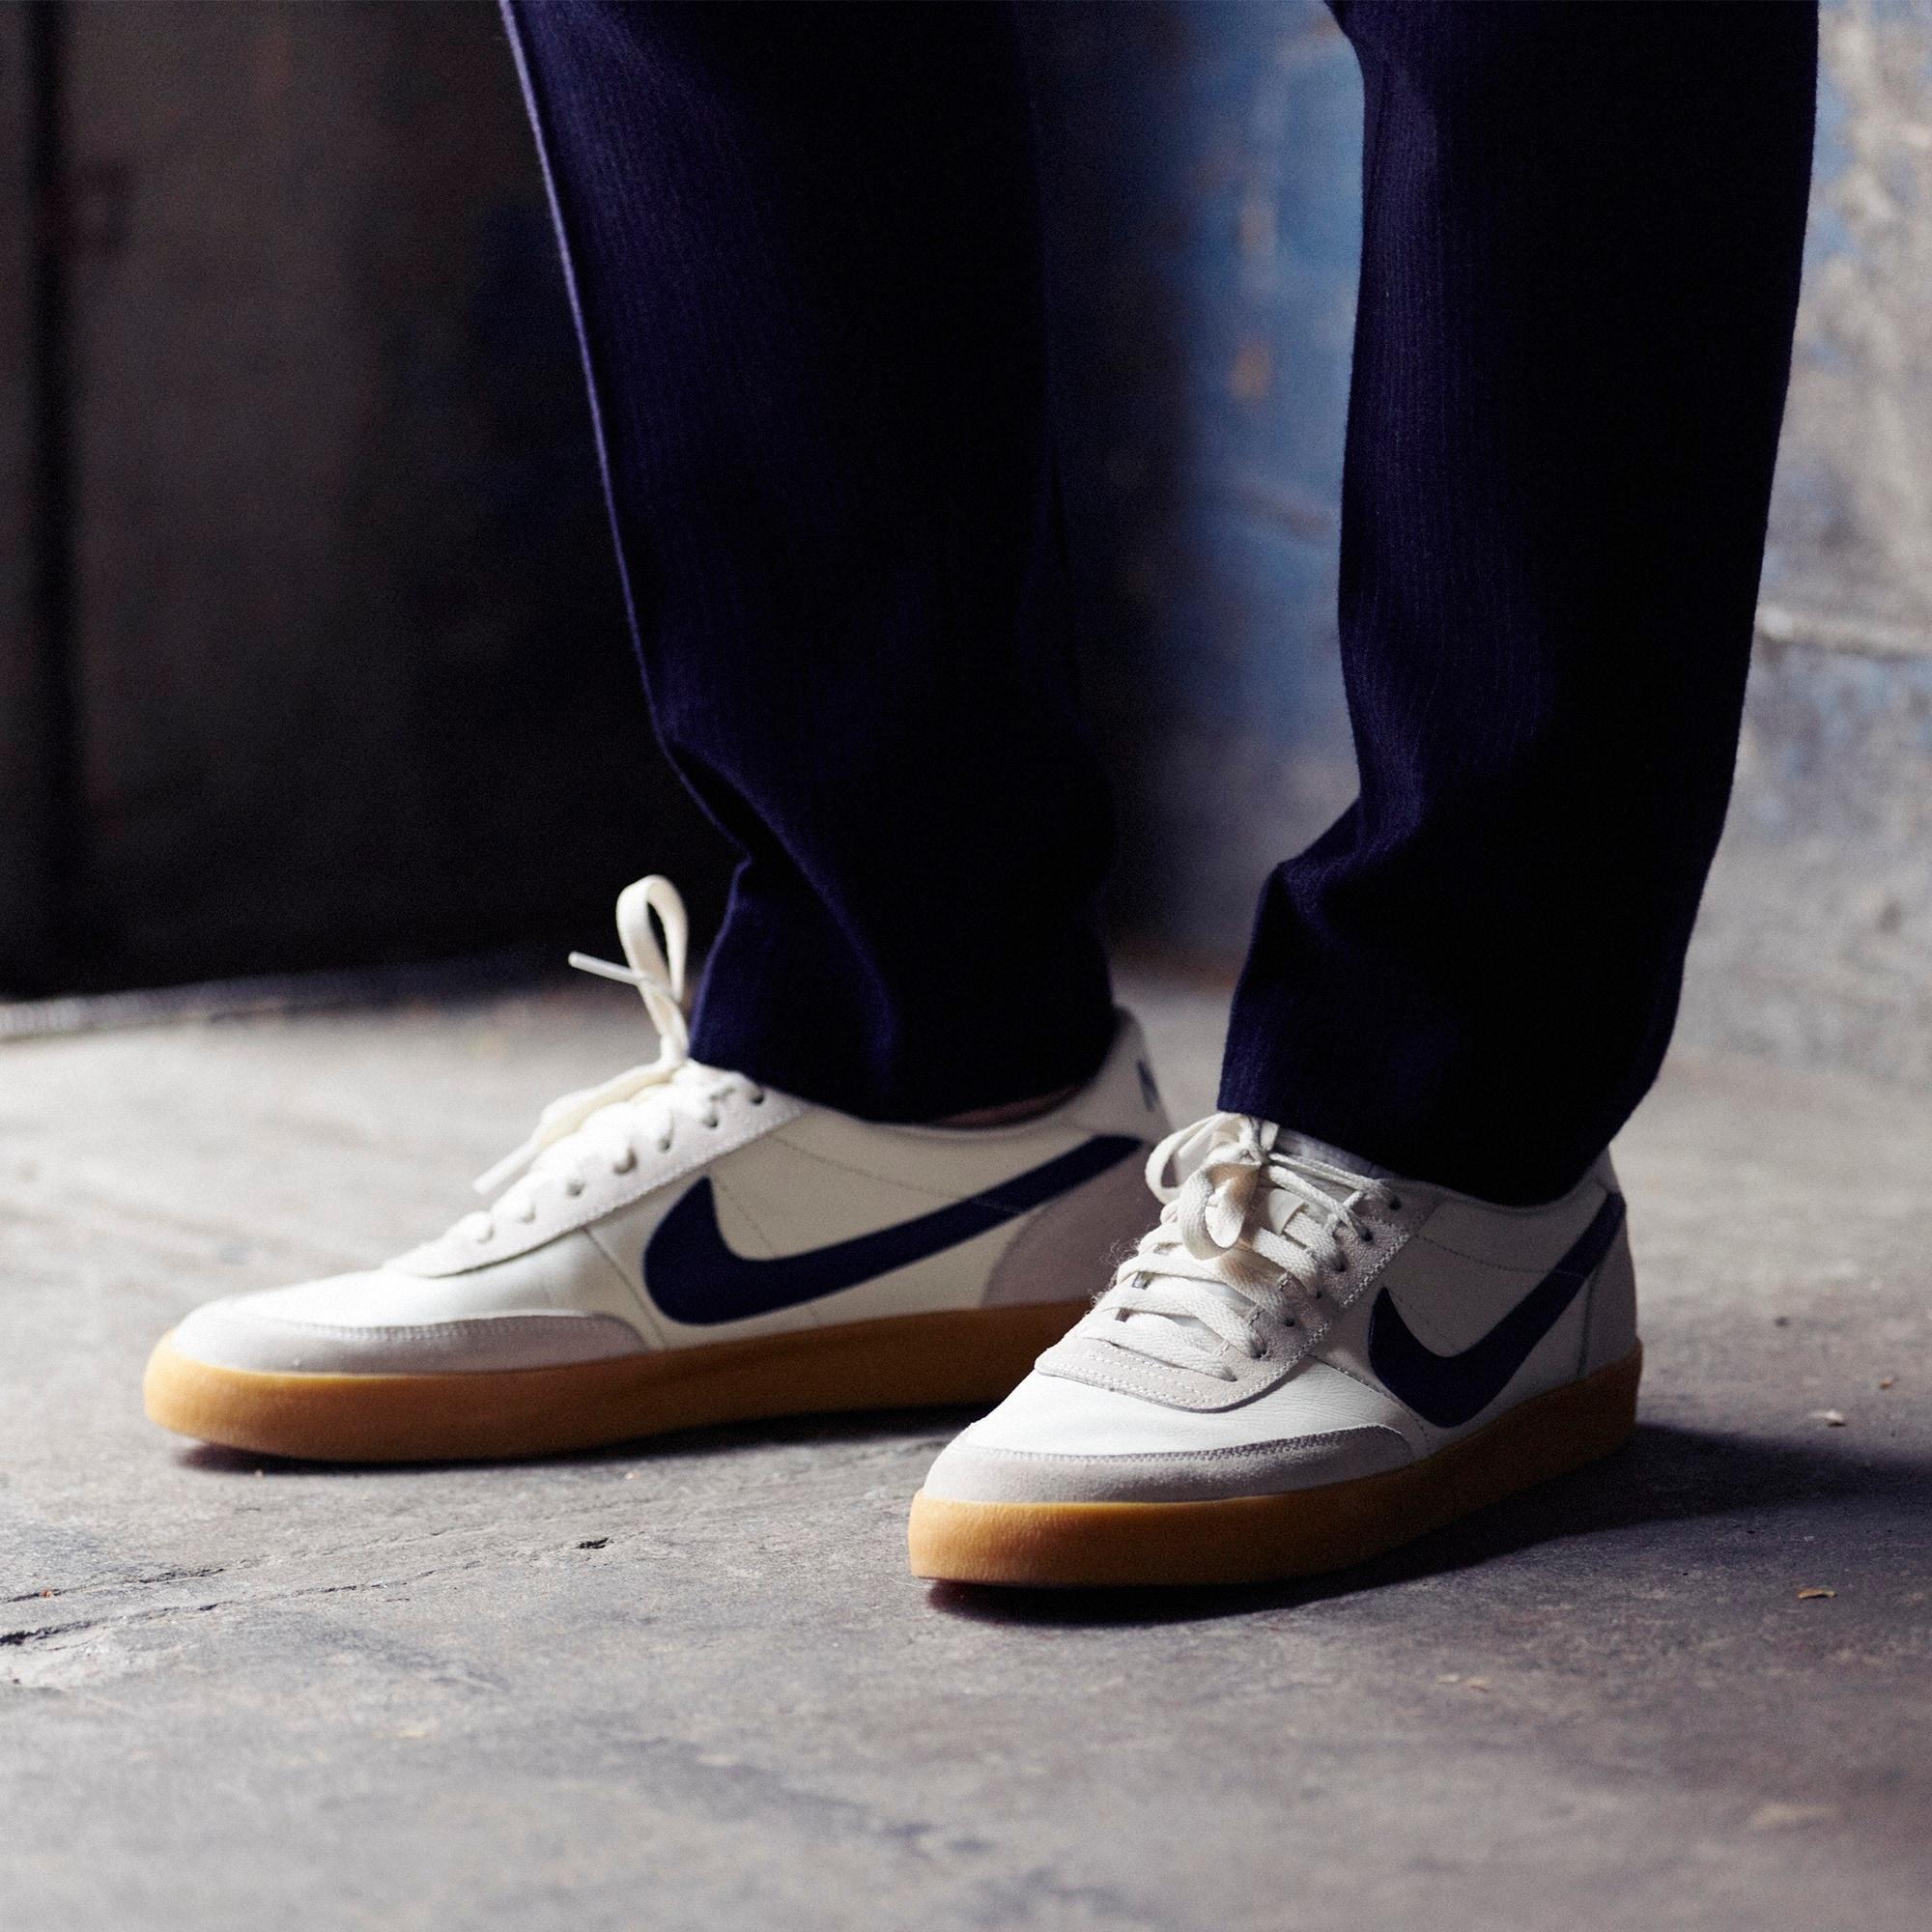 Cosquillas Belicoso Peregrino  Nike ® Killshot 2 Sneakers in White/Blue (White) - Save 85% - Lyst